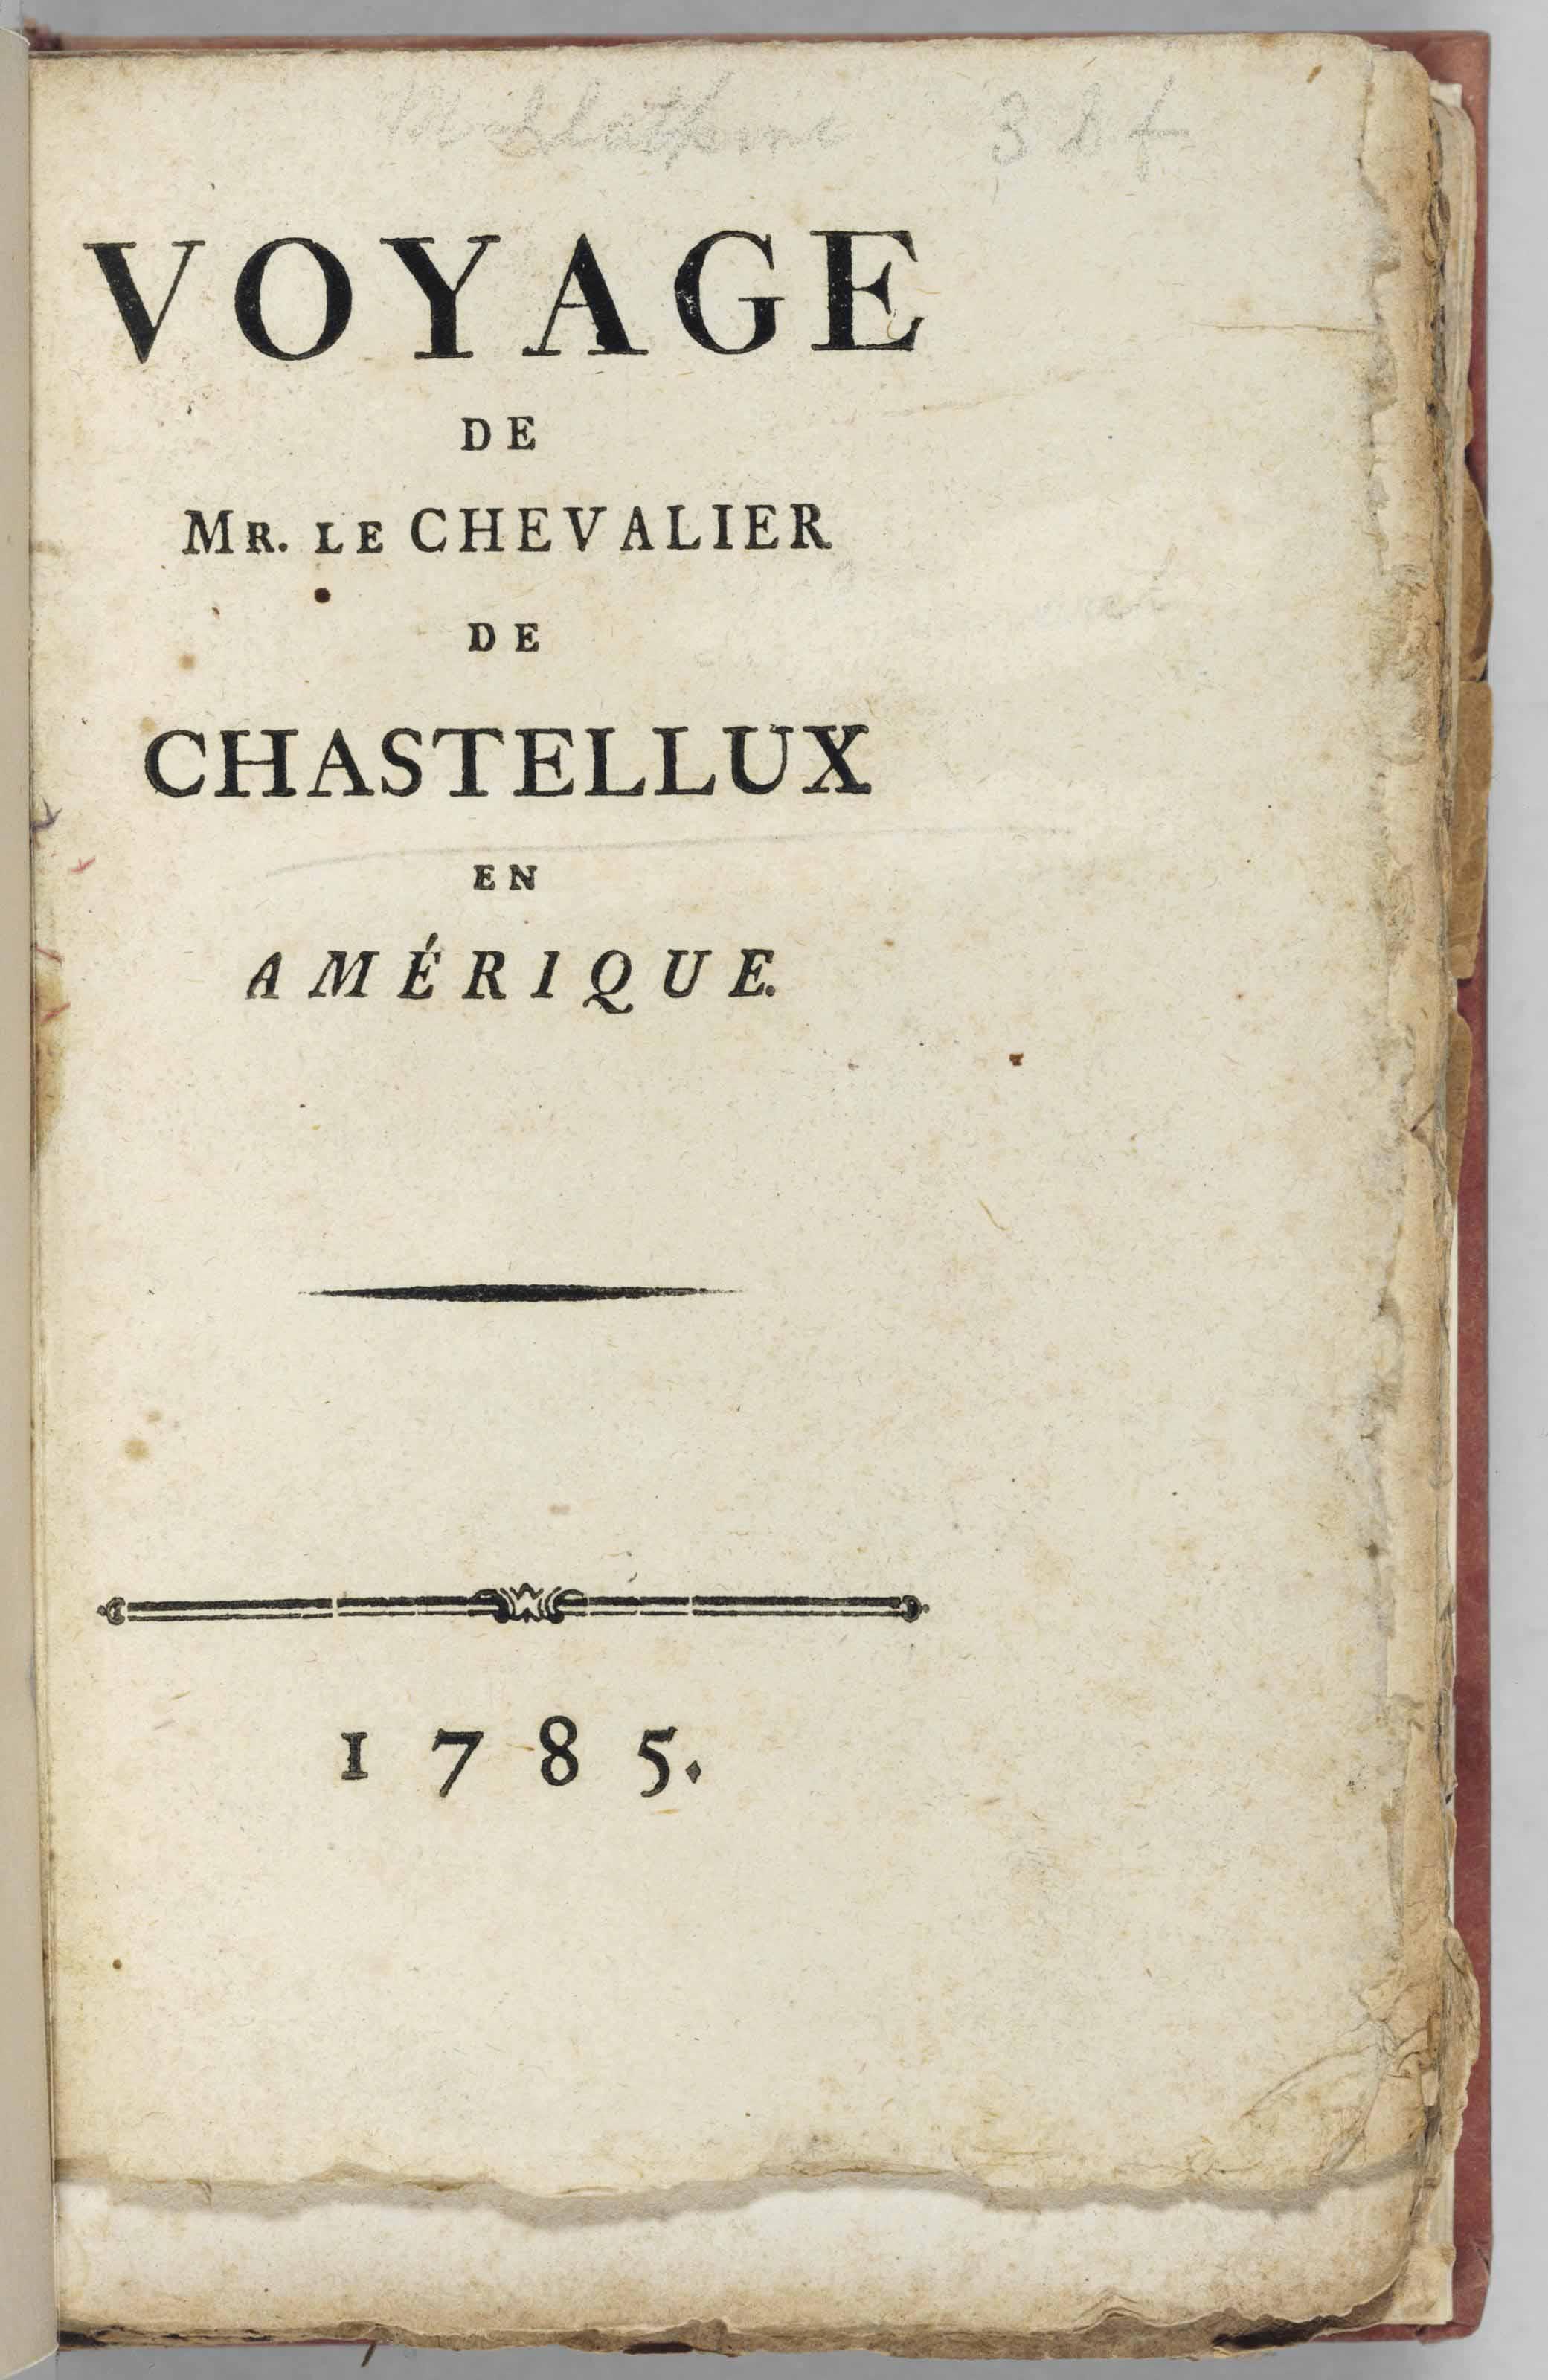 CHASTELLUX, François Jean, Mar